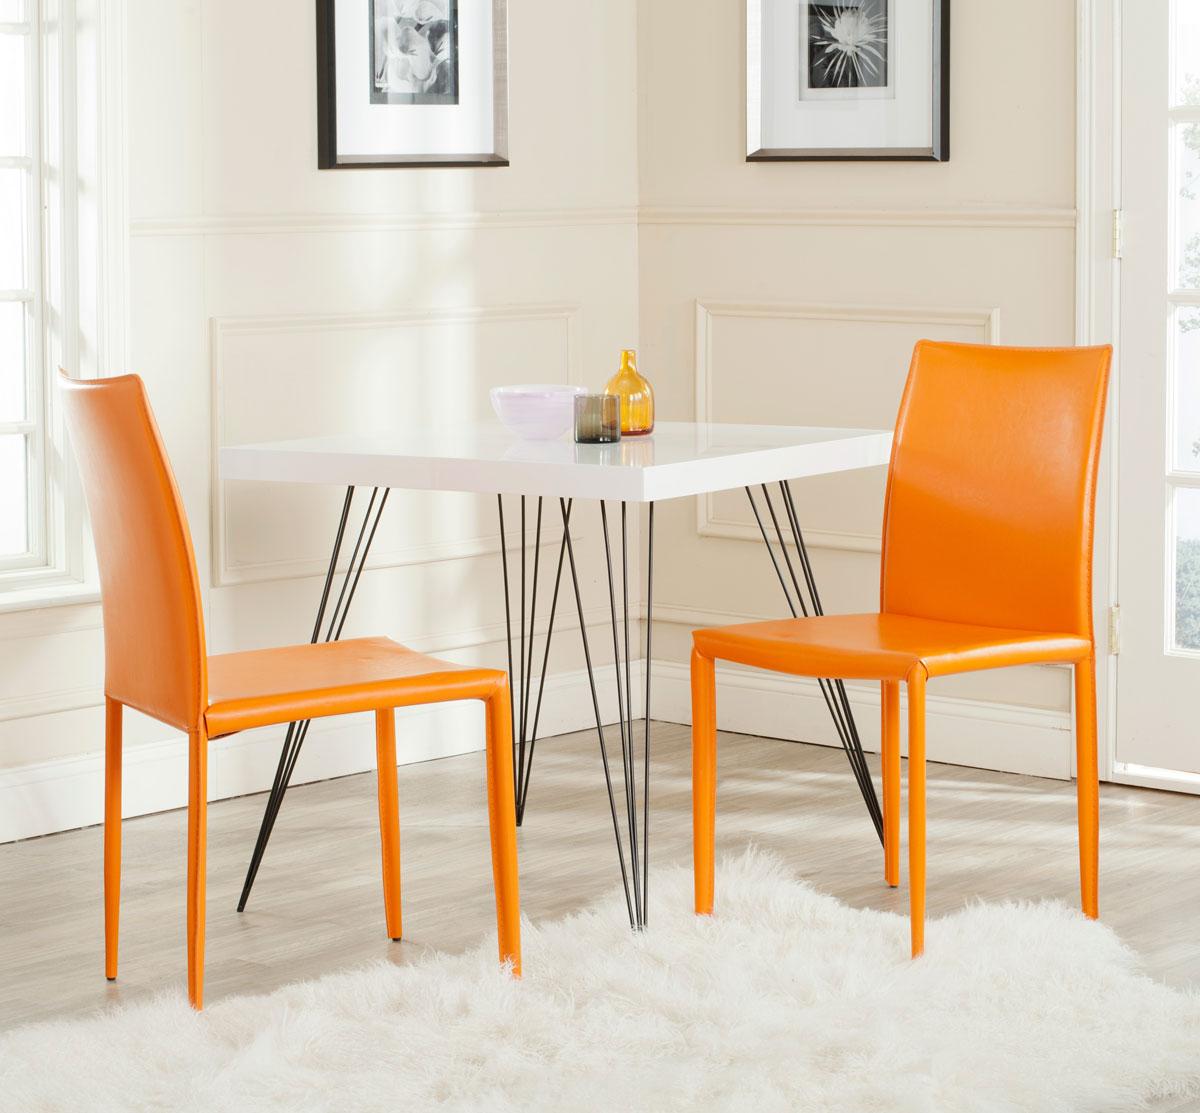 safavieh karna dining chair blue metal folding chairs fox2009g-set2 - furniture by